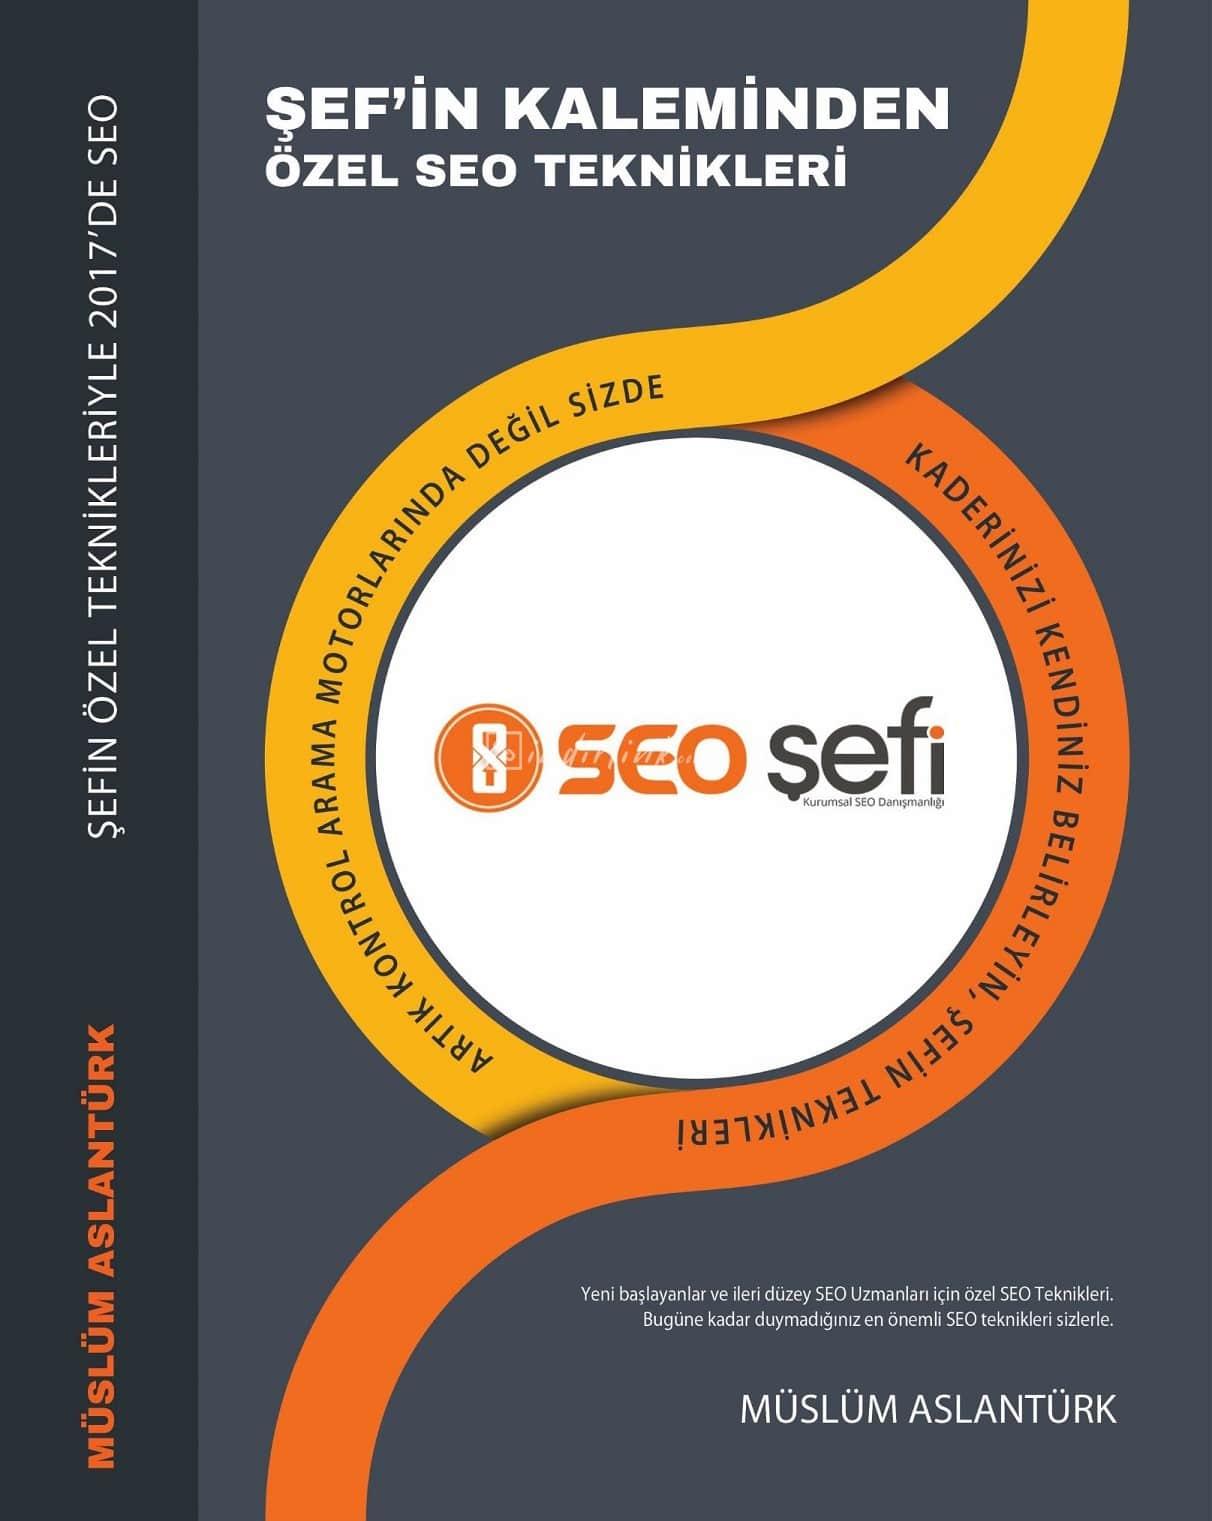 Seo Teknikleri E-Kitap / E-Book (125 Sayfa Türkçe) – Seo Şefi